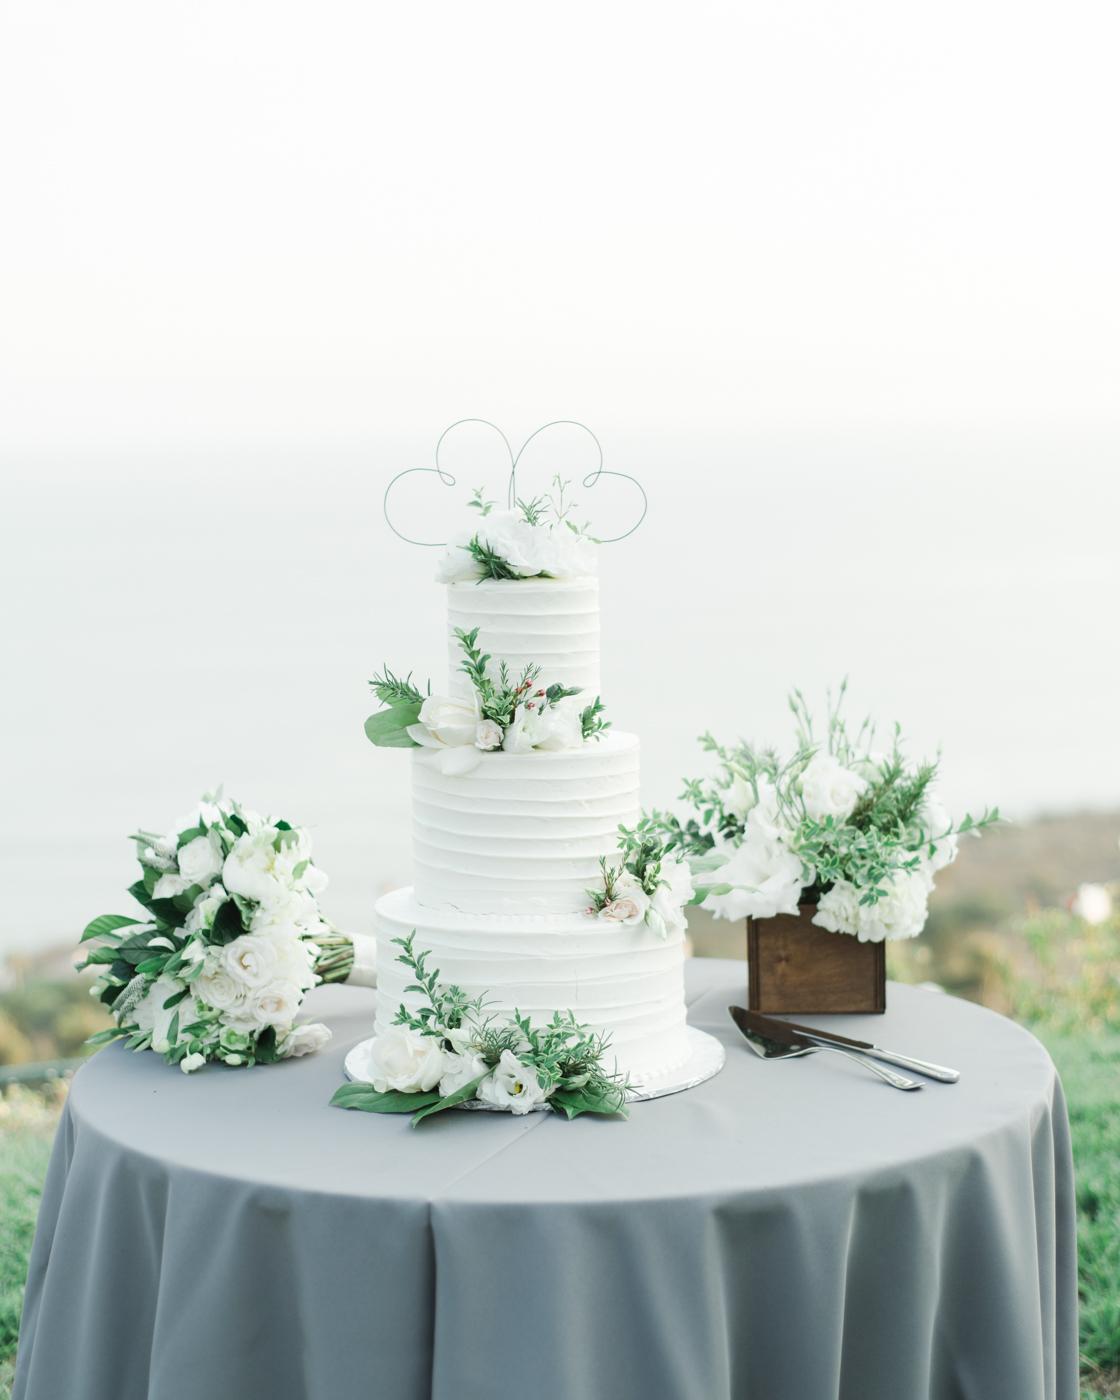 AKP_S&F_Malibu_Wedding_Fine_Art_Photography_Los_Angeles-48_cake.jpg